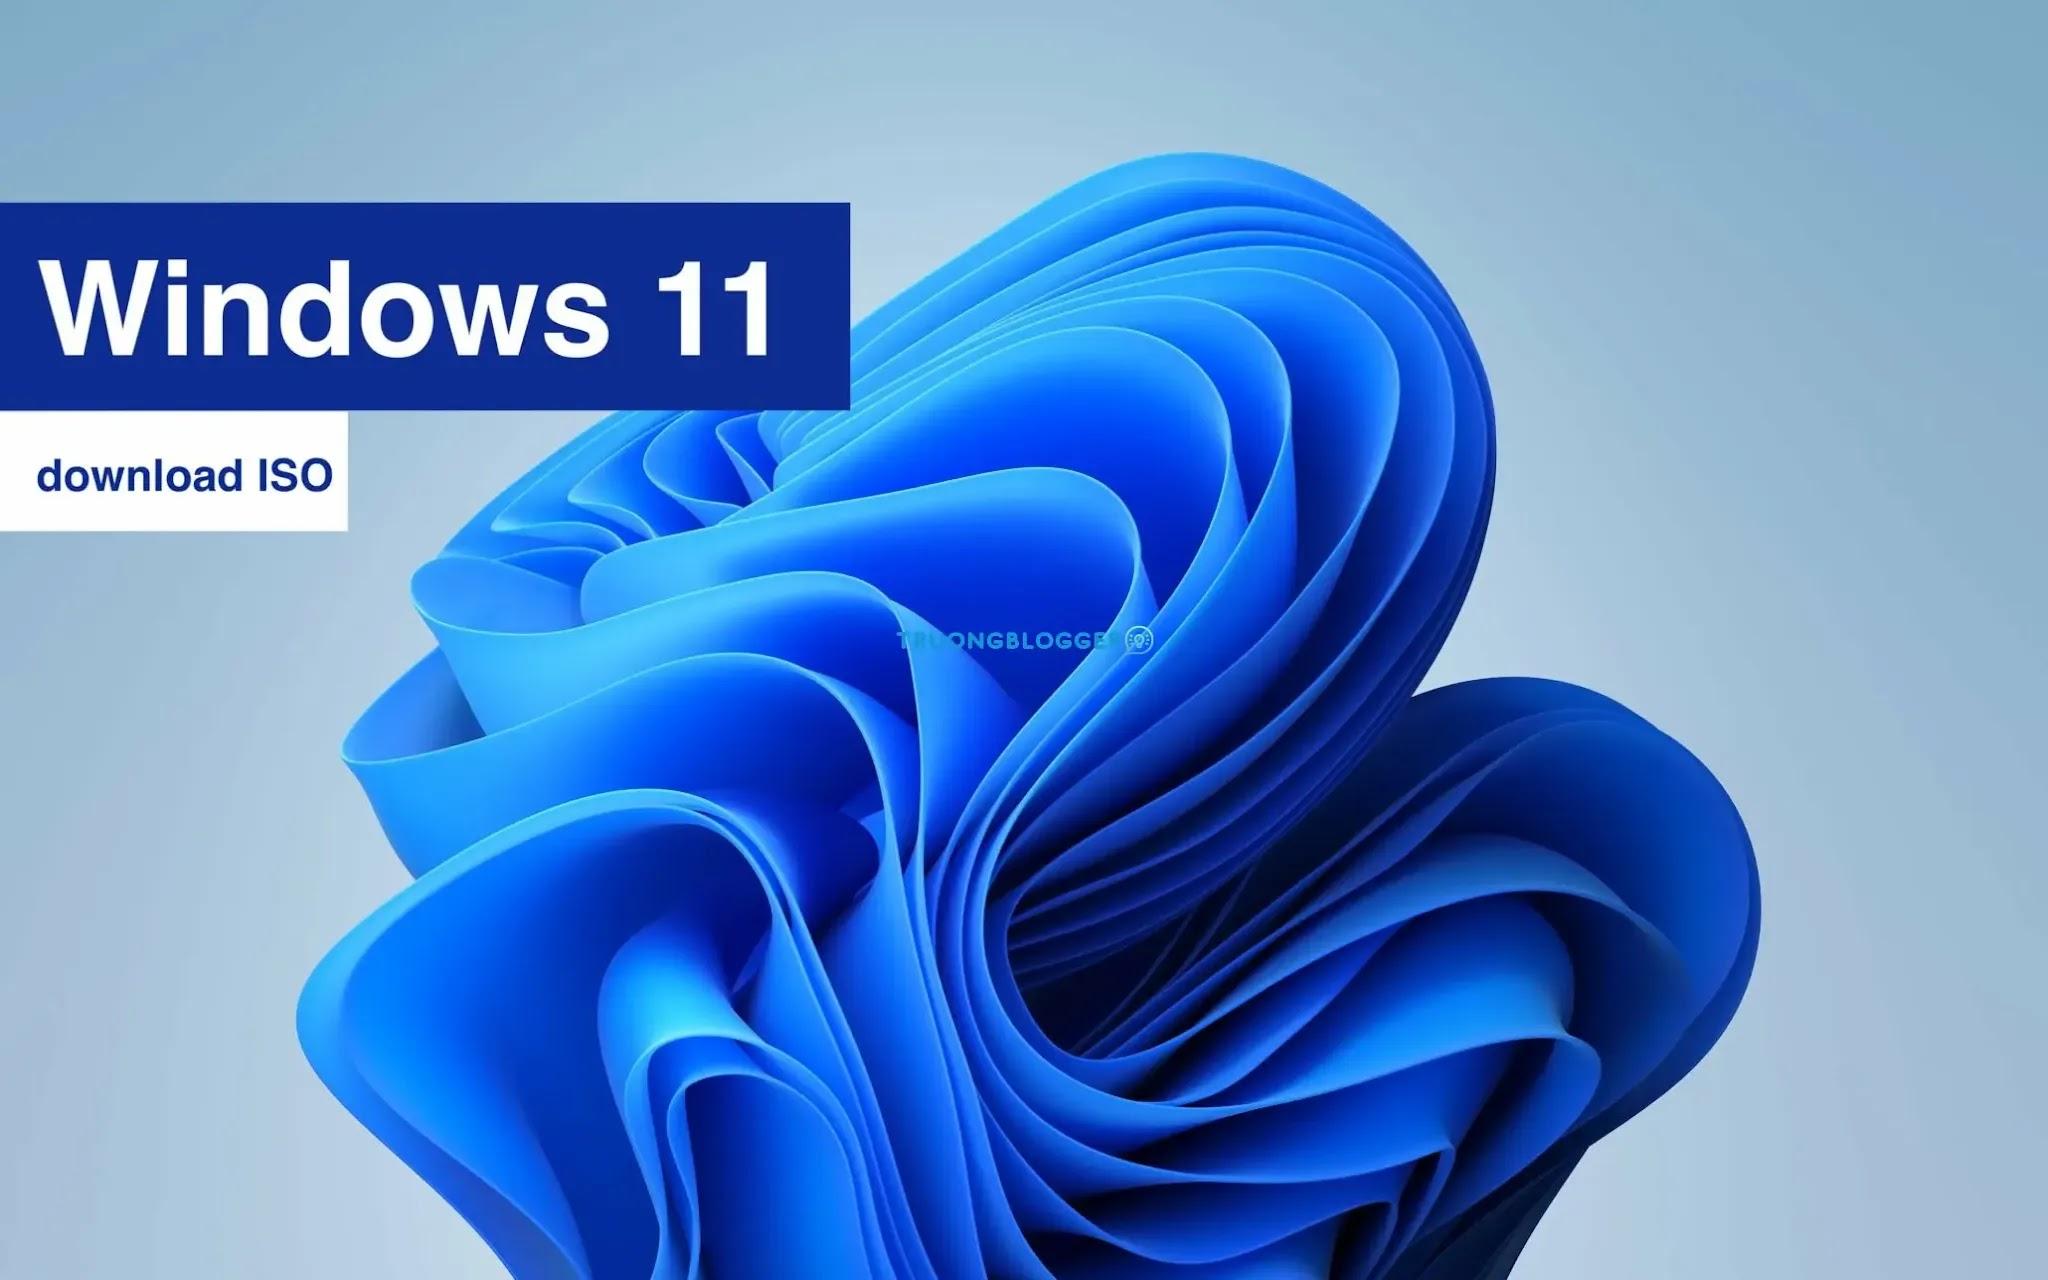 Download ISO Windows 11 AIO build 22000.160 (KB5005189) x64 DEV